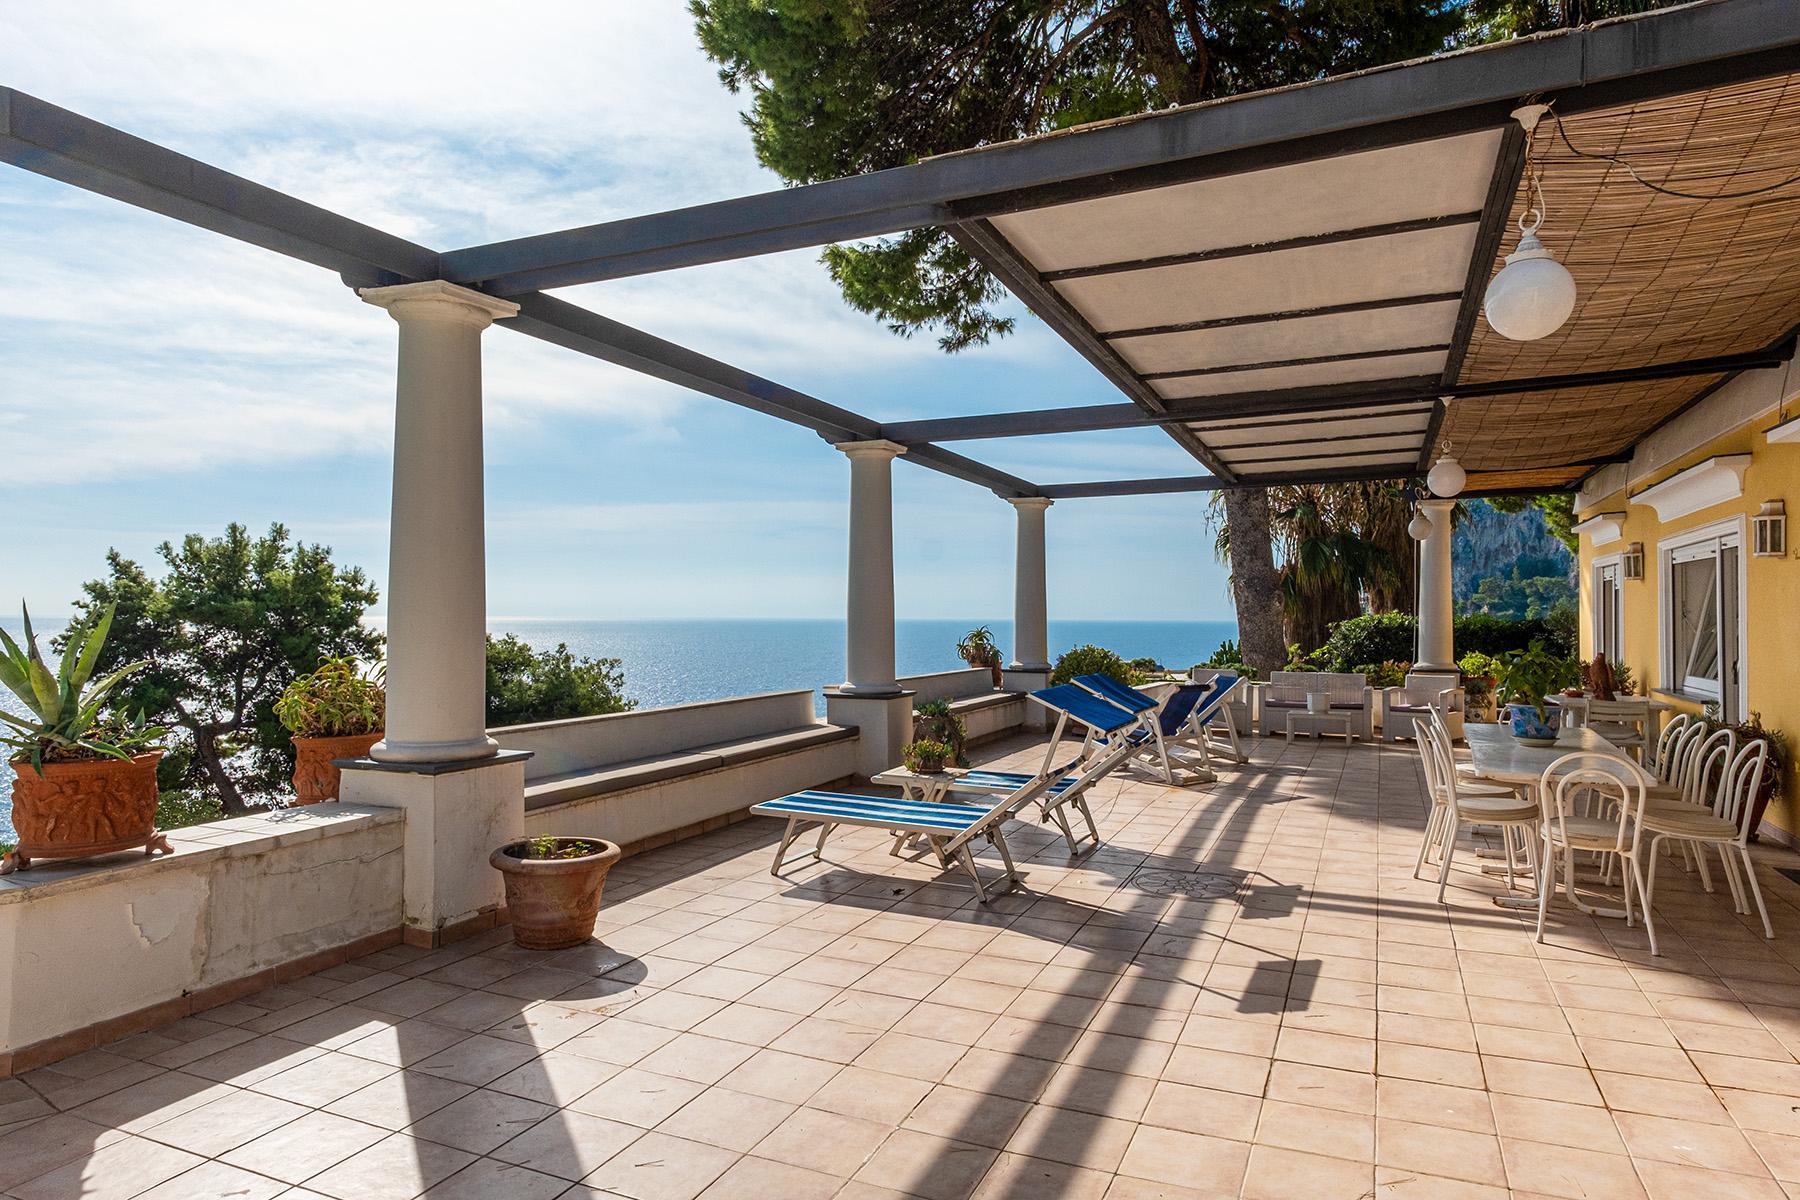 Enchanted villa overlooking the sea - 1